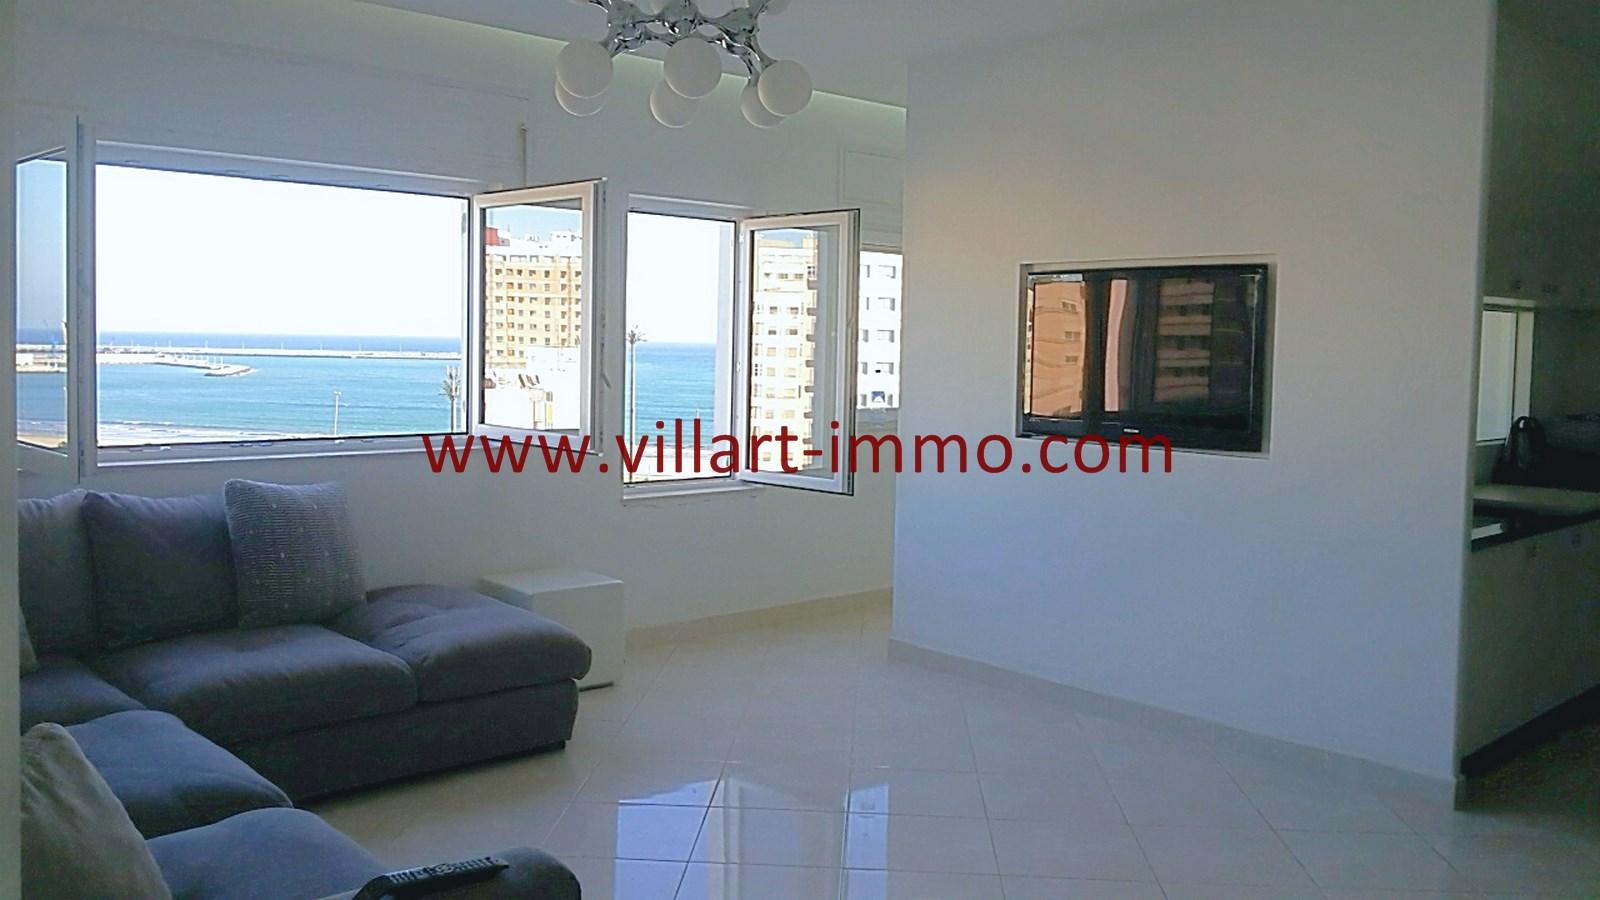 2-Vente-Appartement-Tanger-Malabata-Salon 1-VA490-Villart Immo (Copier)